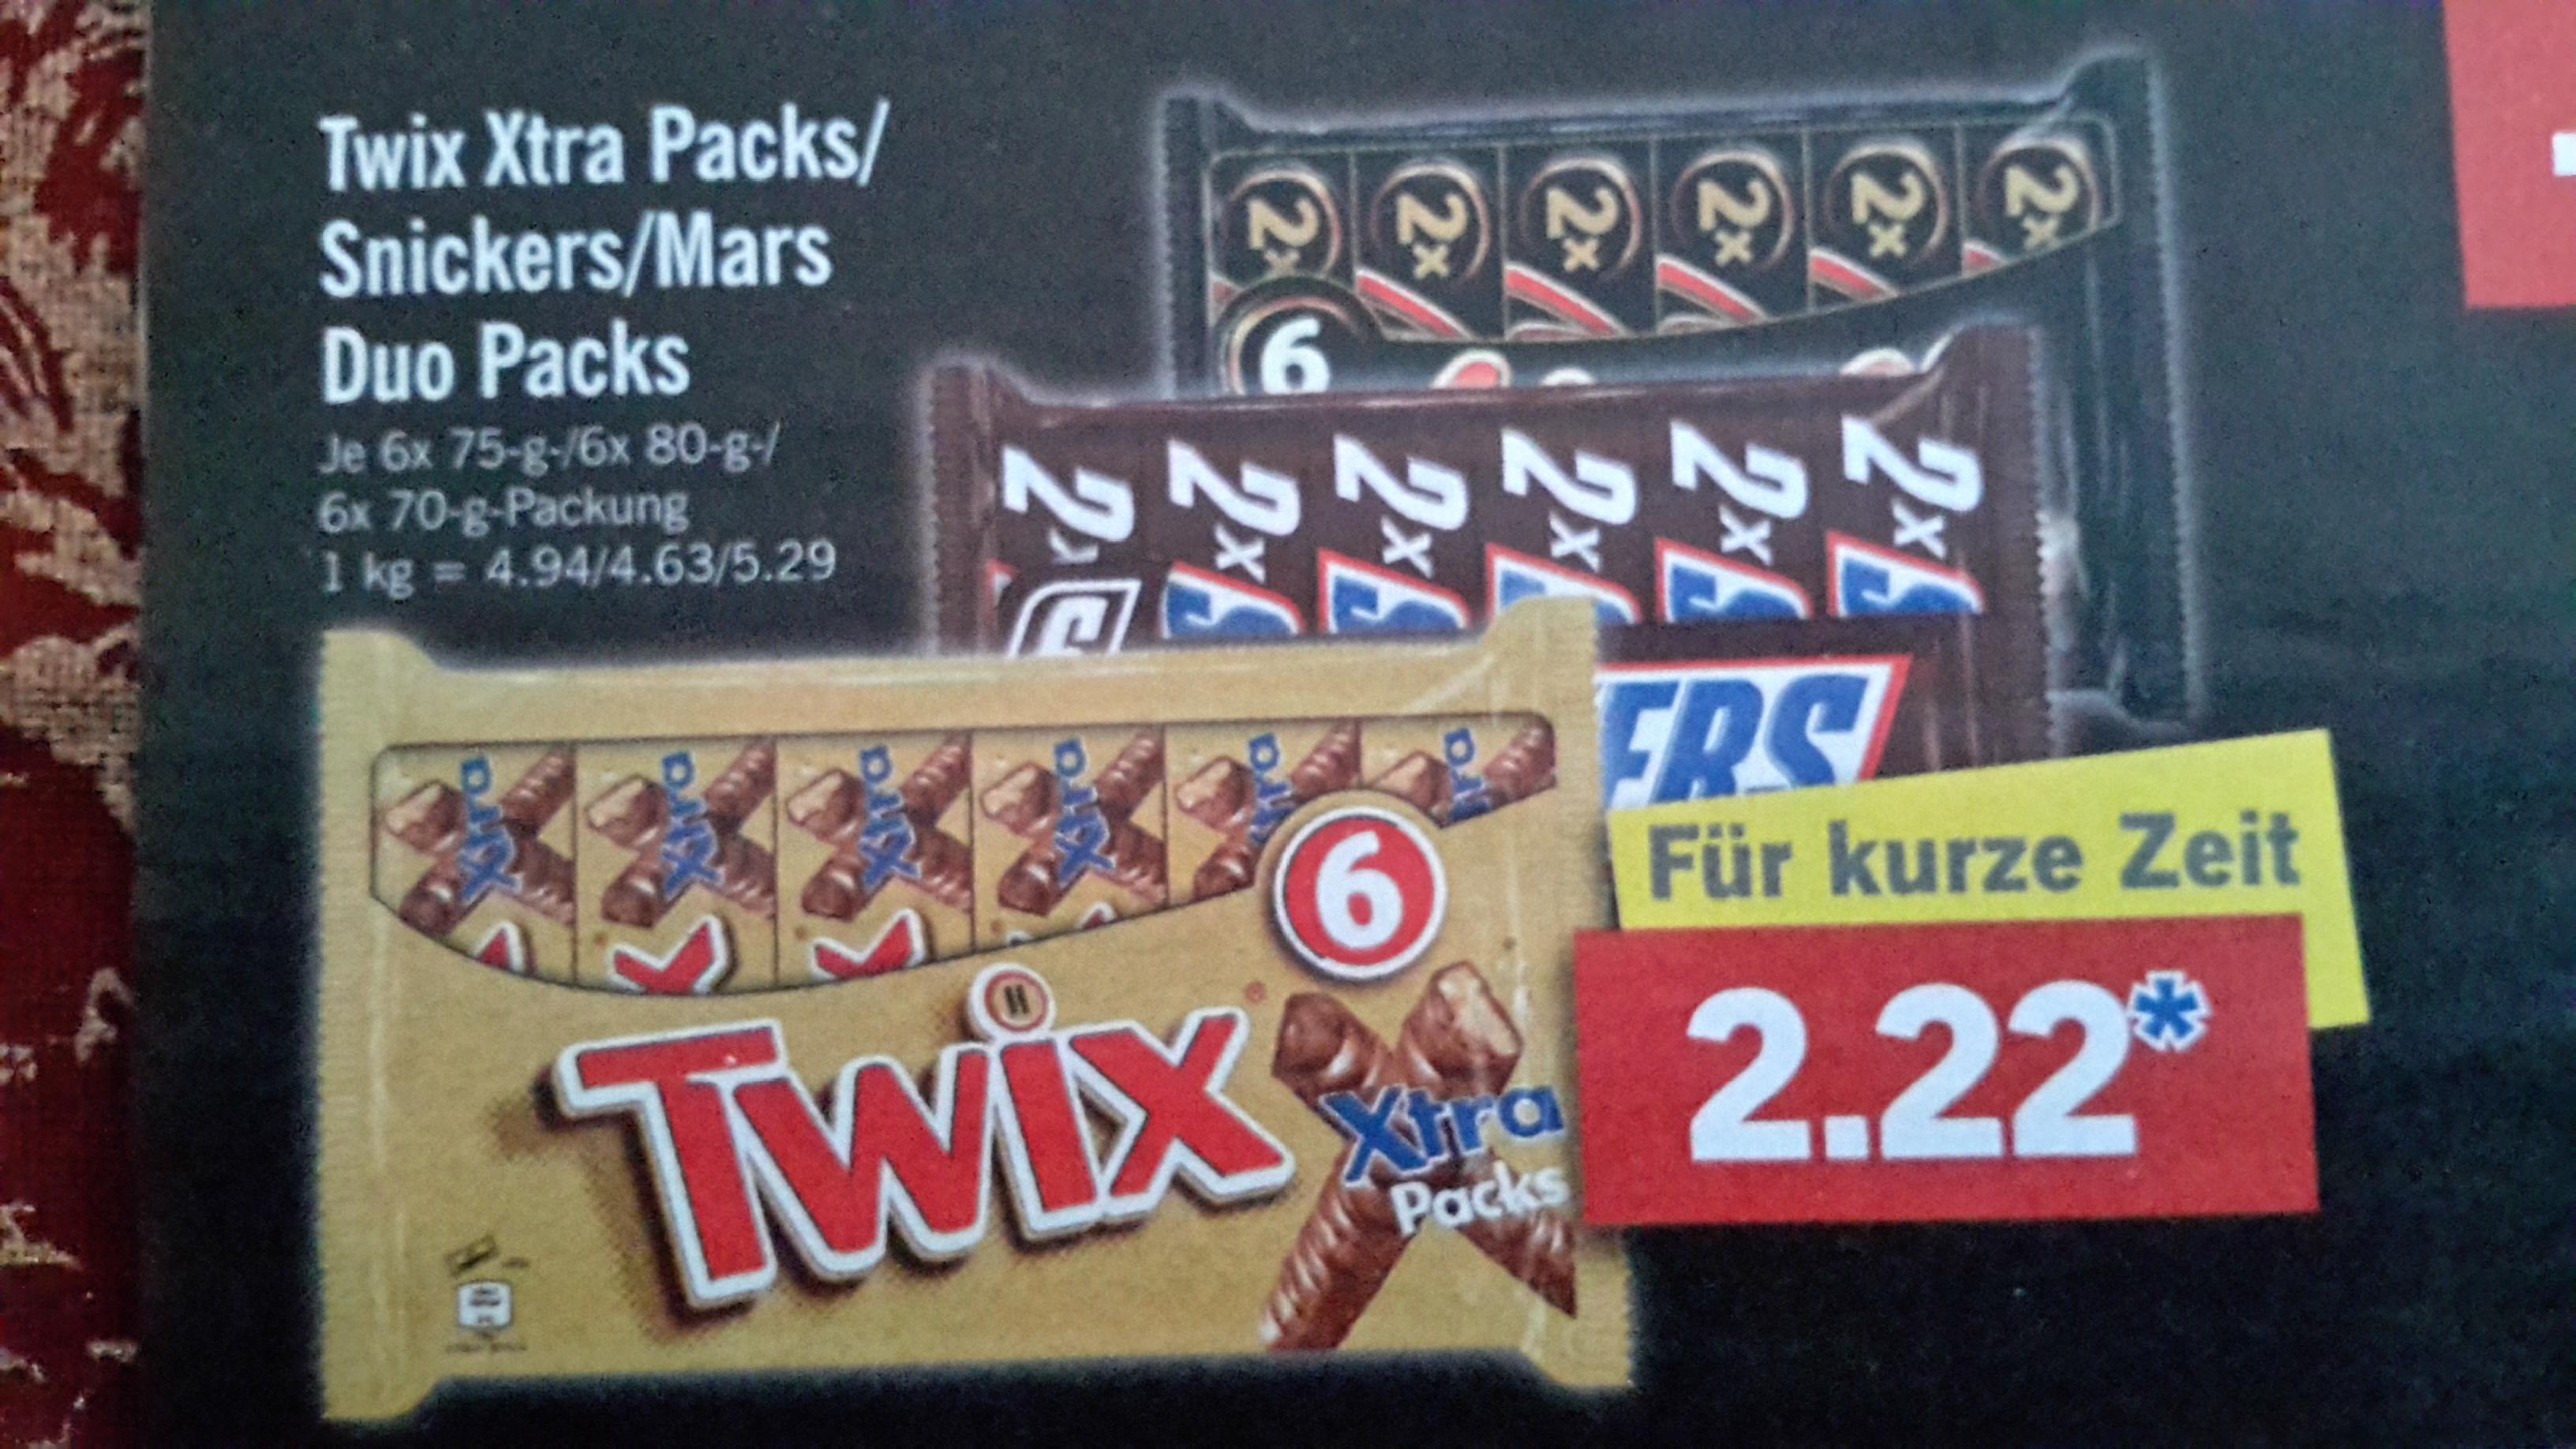 [Lidl] Twix Xtra Packs / Snickers Duo Packs / Mars Duo Packs je 6 Stück für 2,22 € am 21.01.17